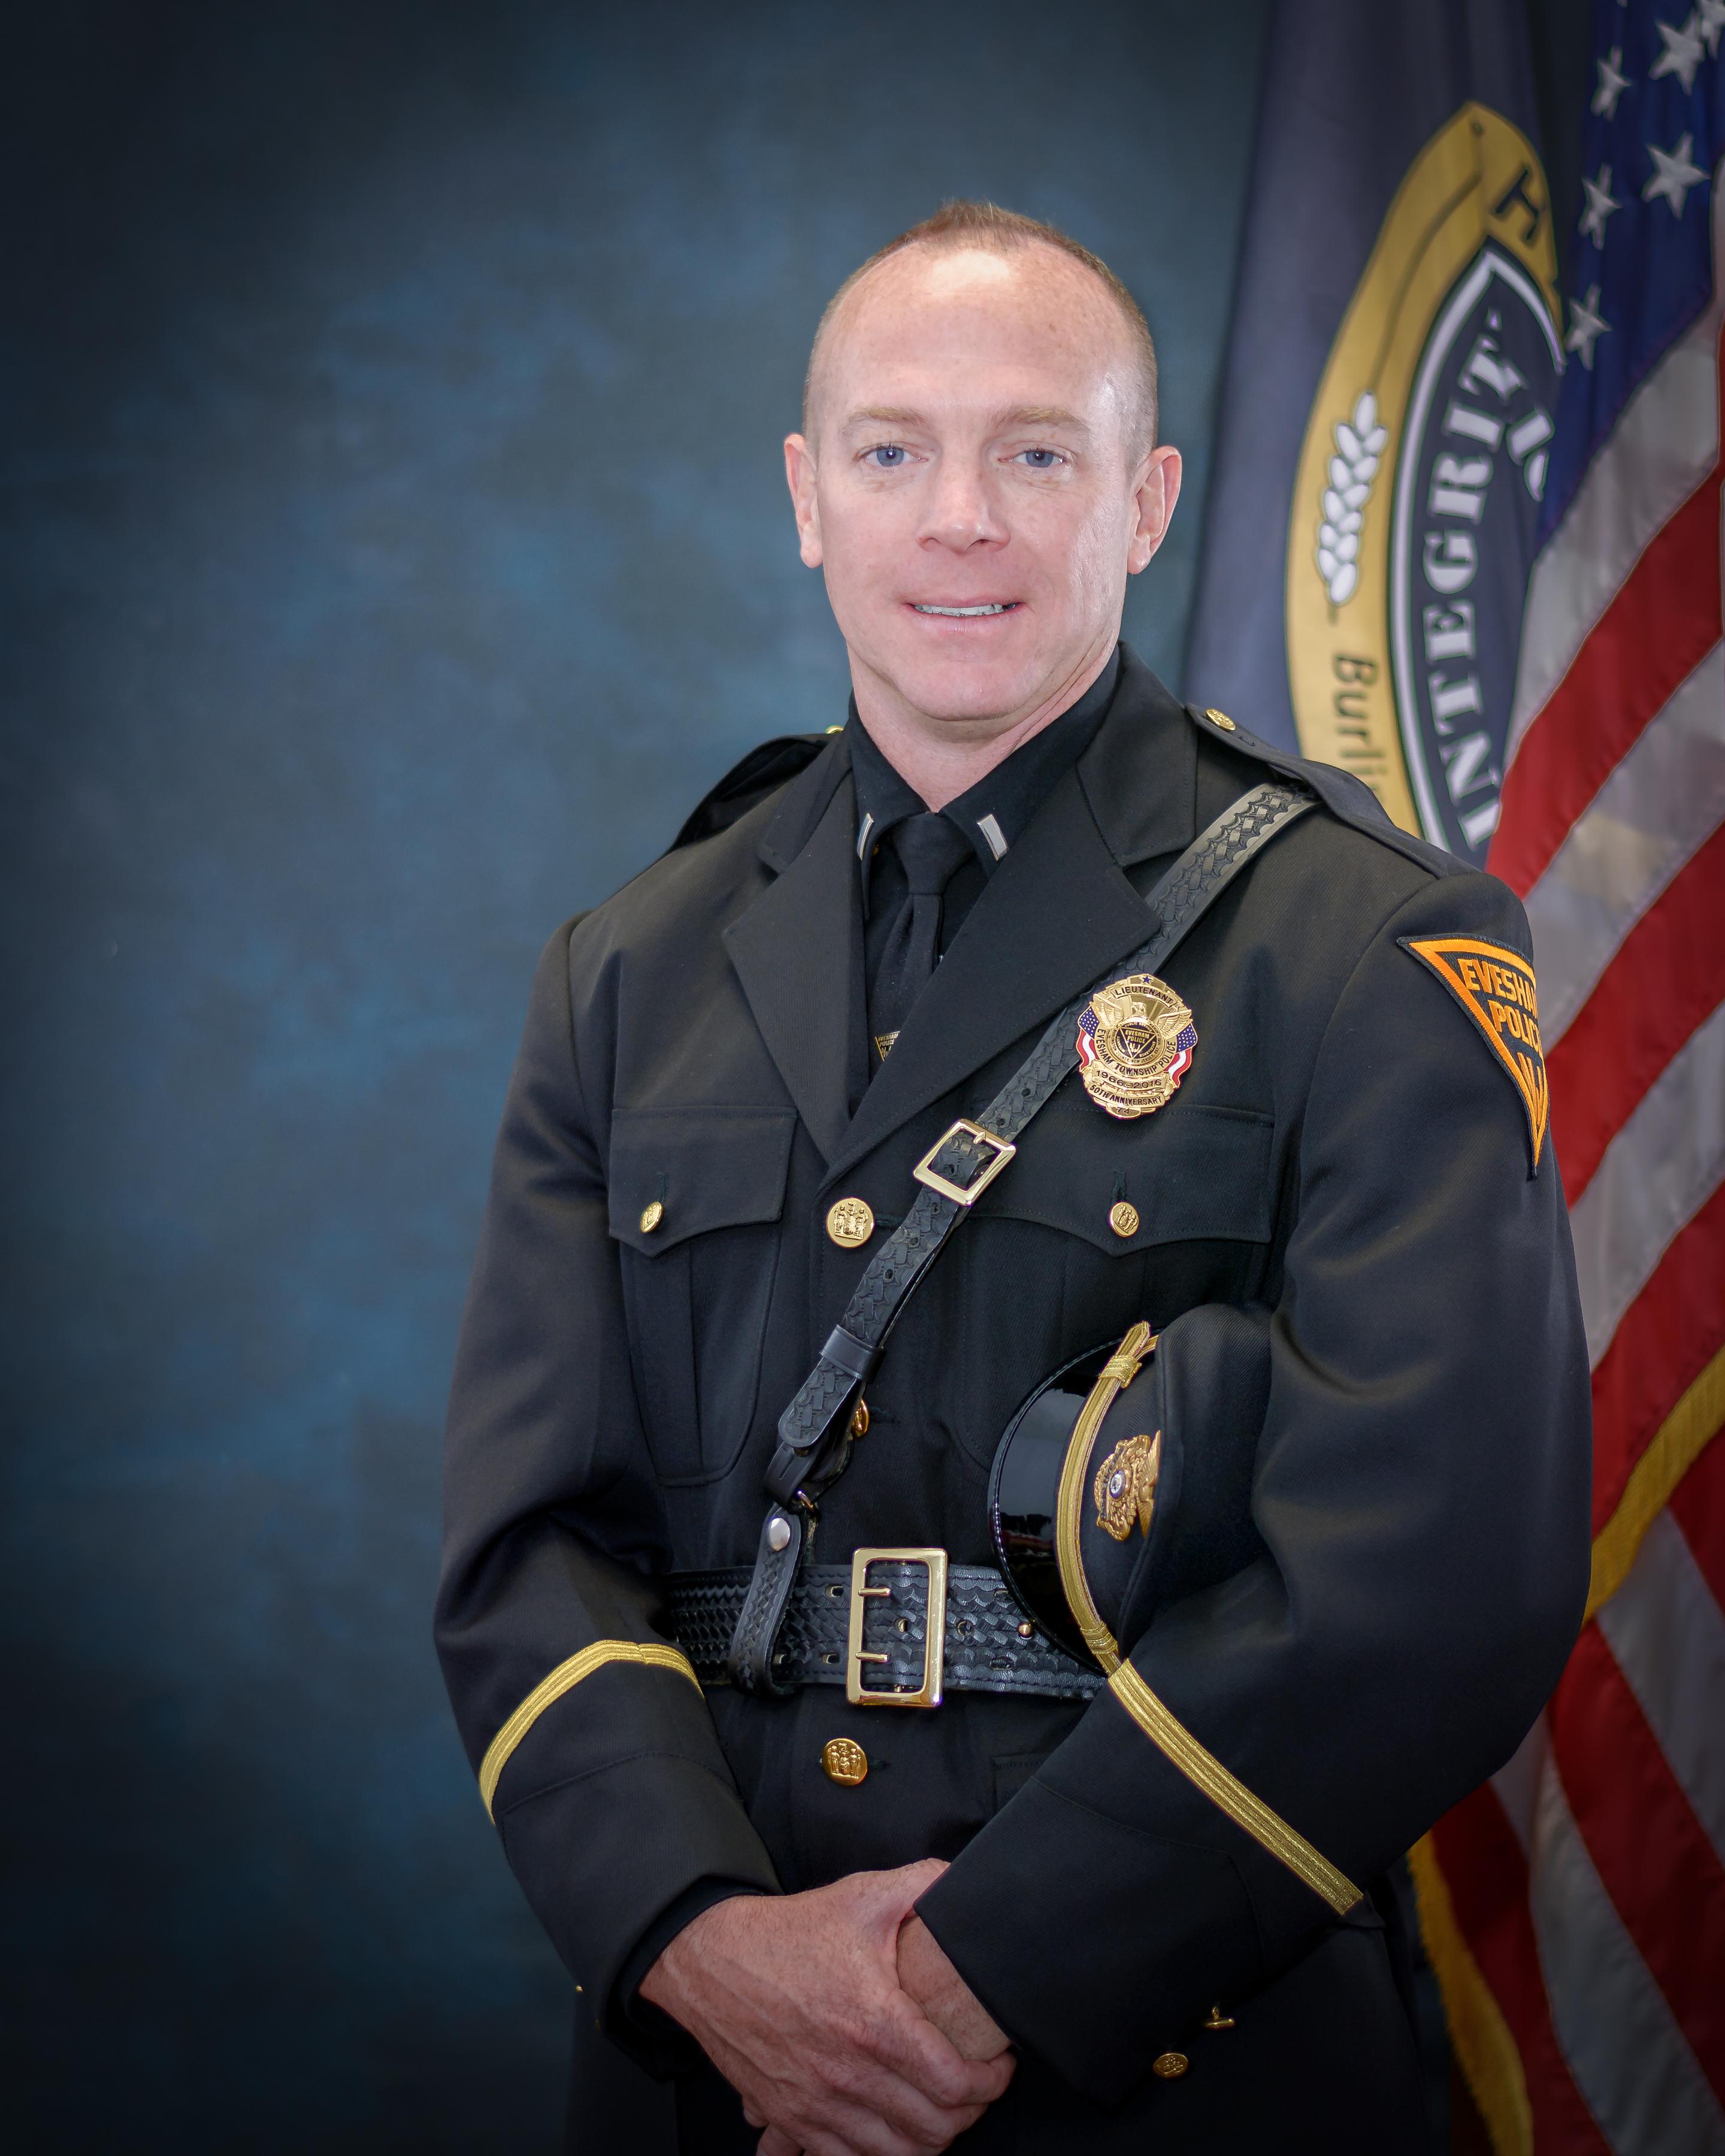 Support Services Bureau Commander - Lieutenant Brian Rosenberg